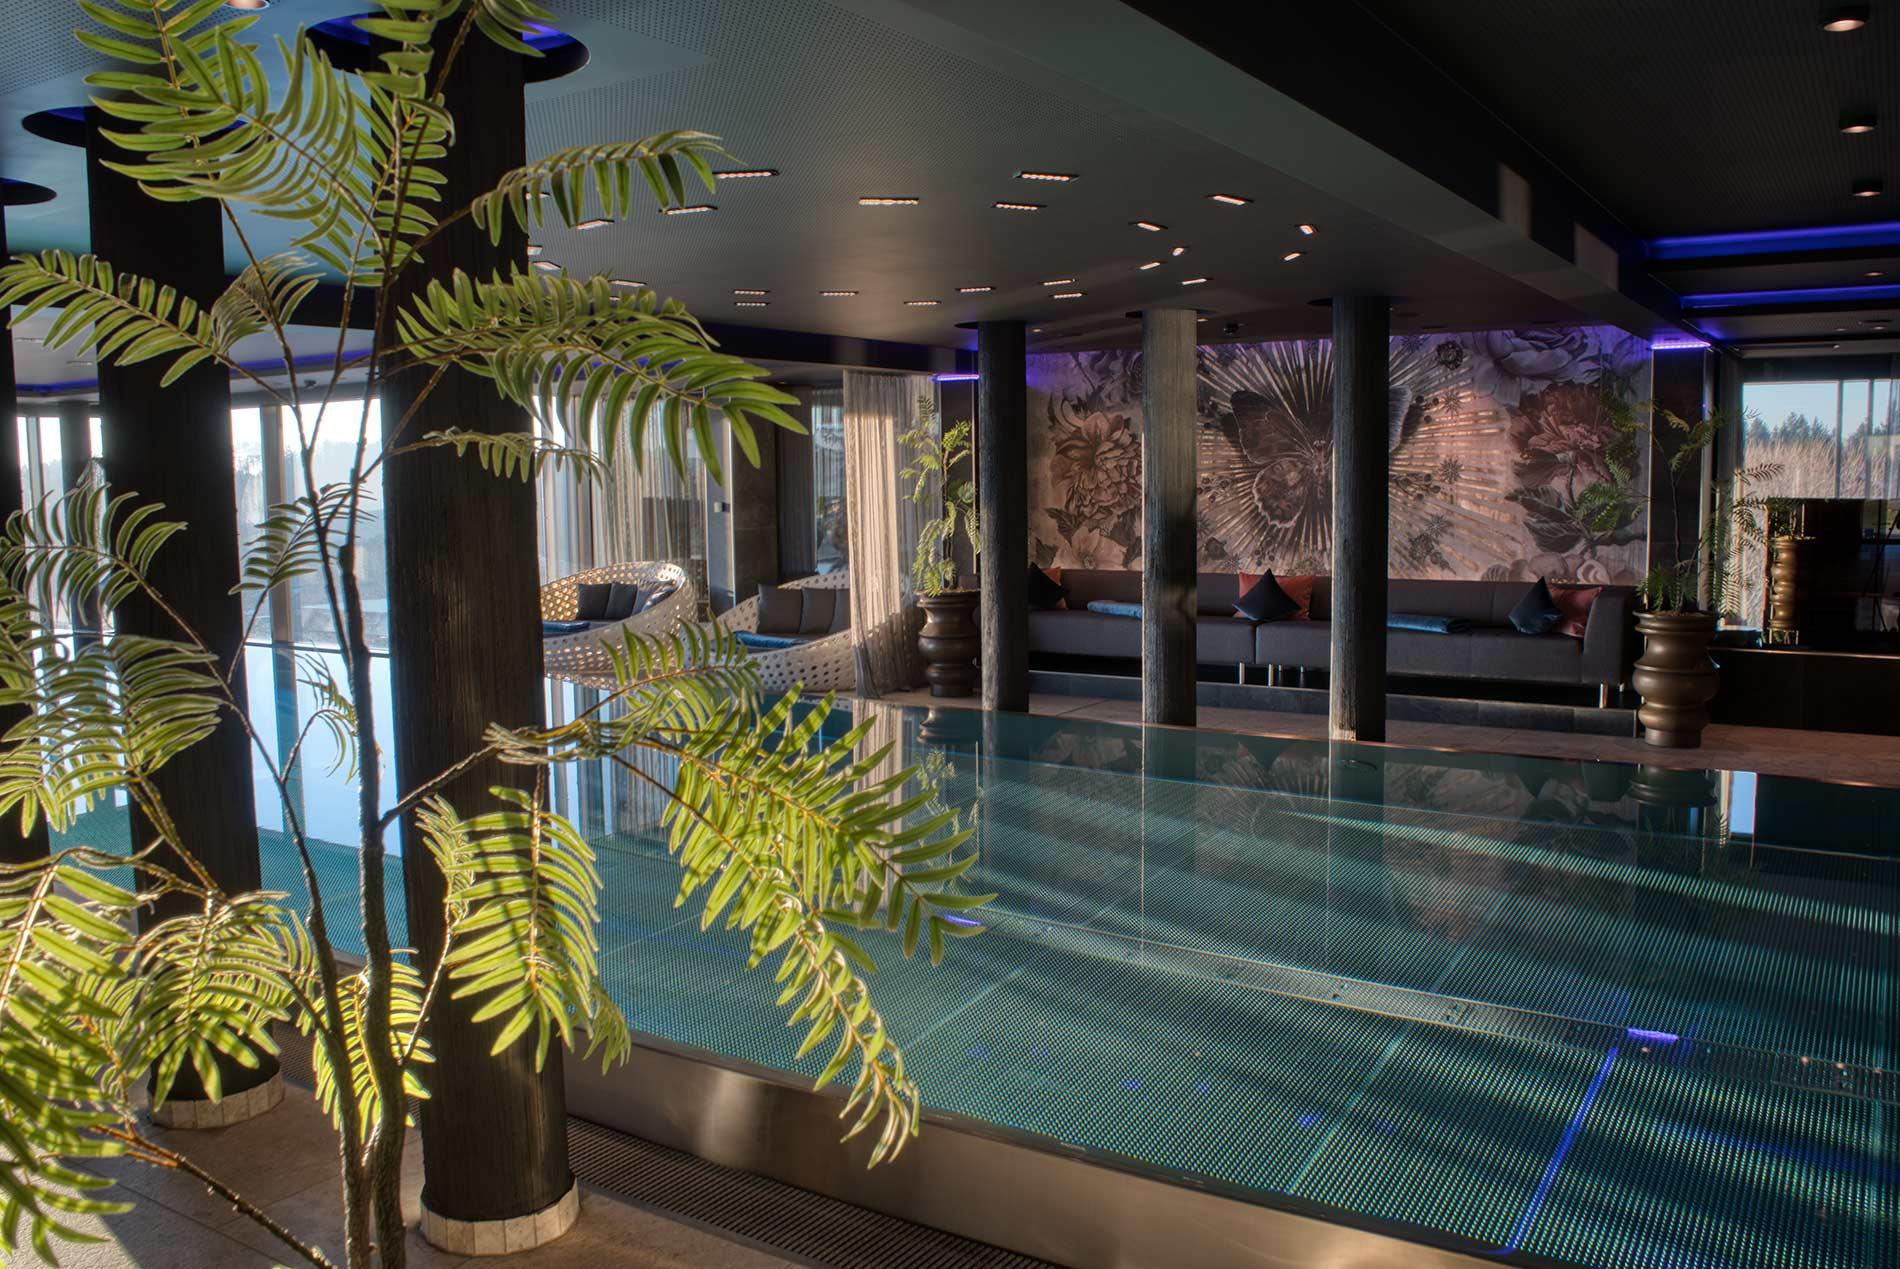 angerhof sport wellnesshotel in st englmar. Black Bedroom Furniture Sets. Home Design Ideas